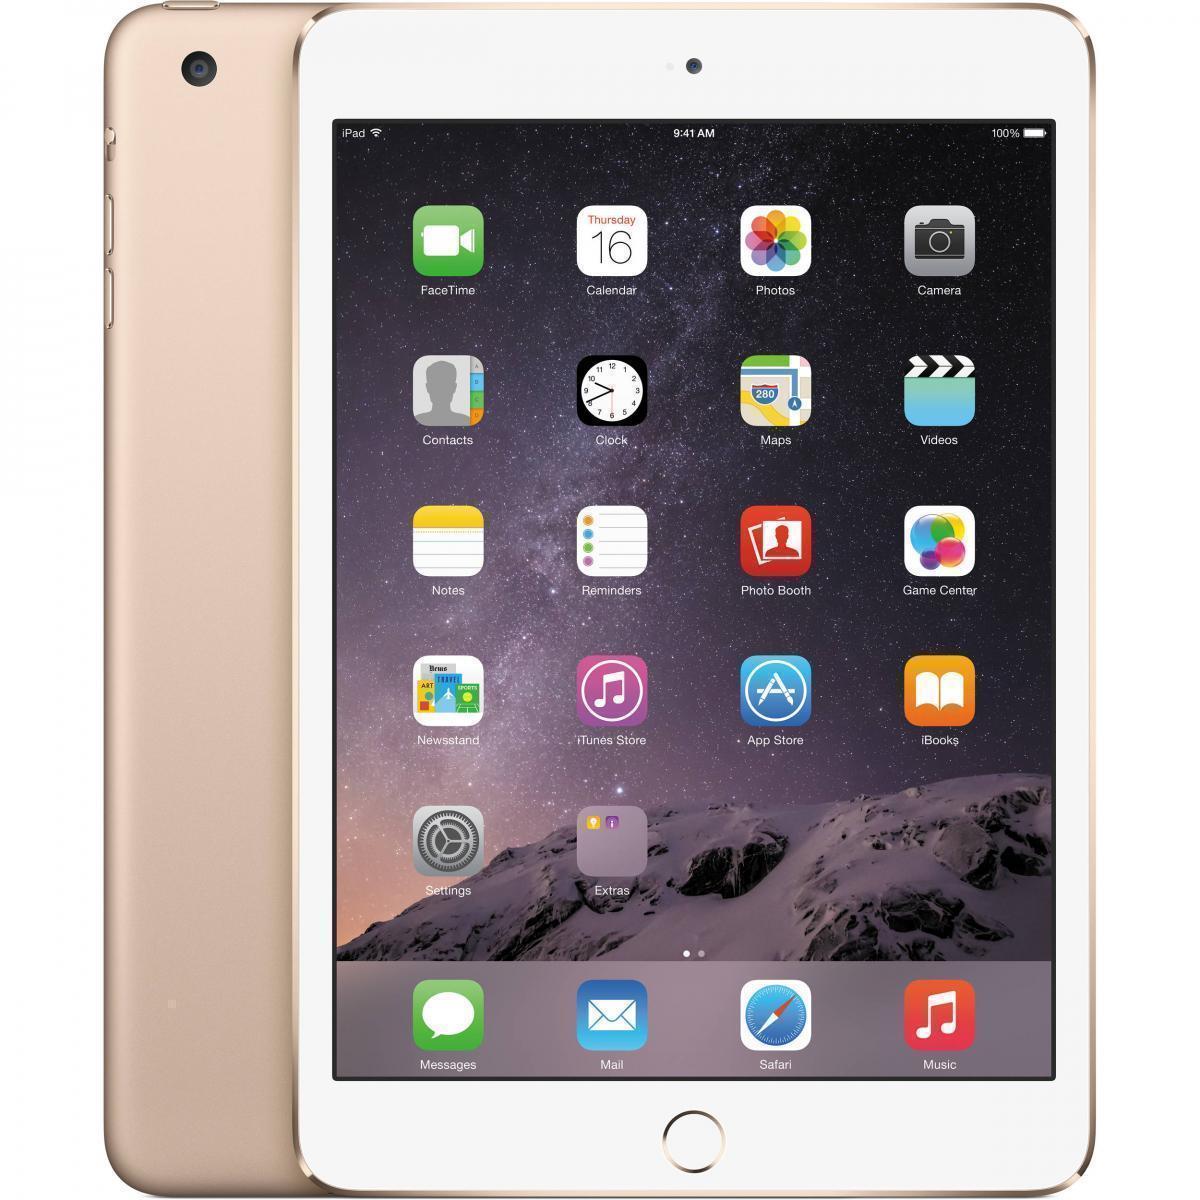 Apple iPad mini 4 16Gb Wi-Fi + Cellular GoldiPad mini 4<br>Планшет Apple iPad mini 4 16Gb Wi-Fi + Cellular Gold<br>